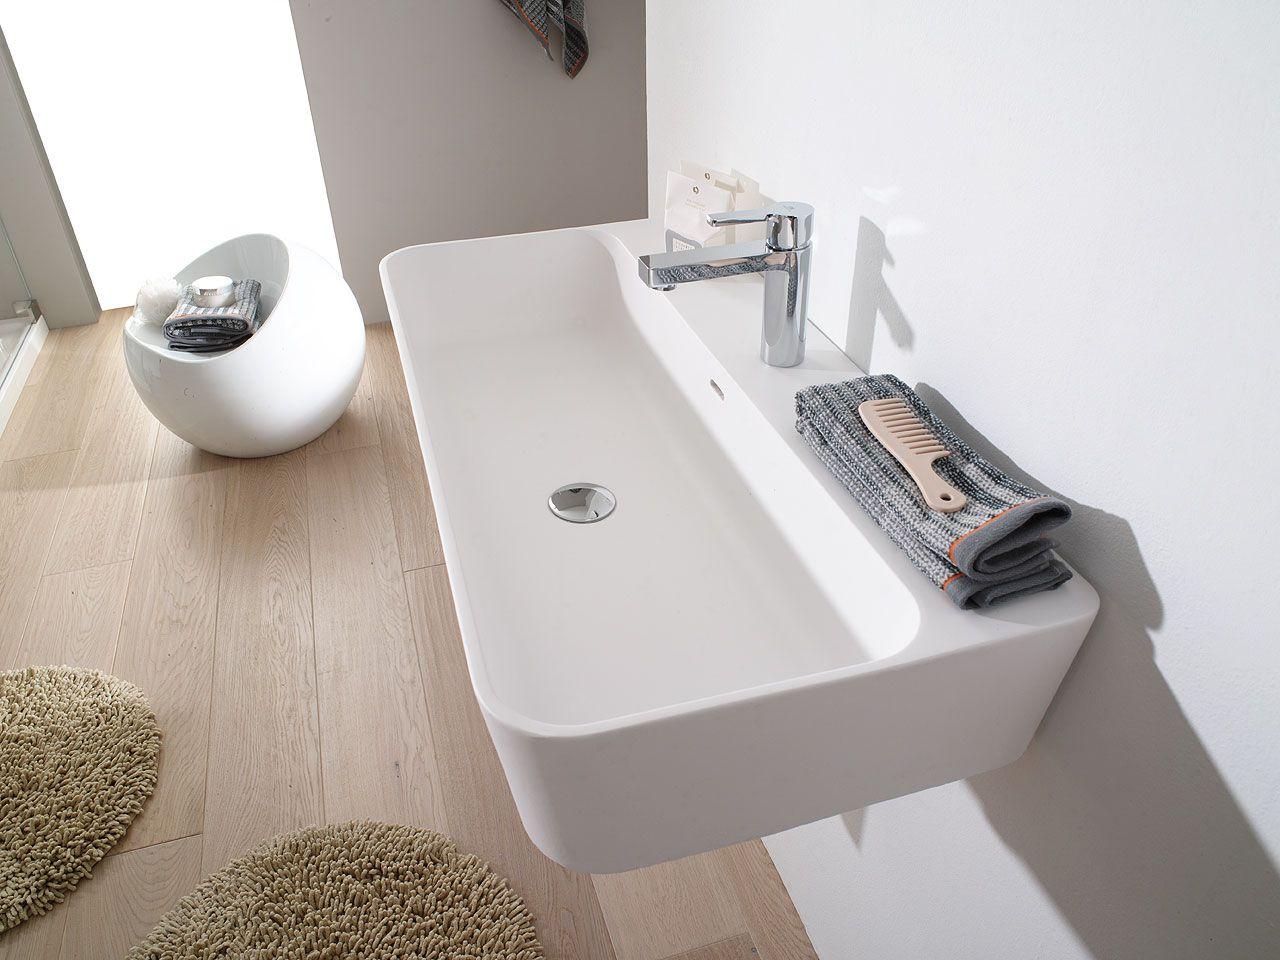 Porcelanosa Lavabo Bathroom Sink Sink Bathroom Items